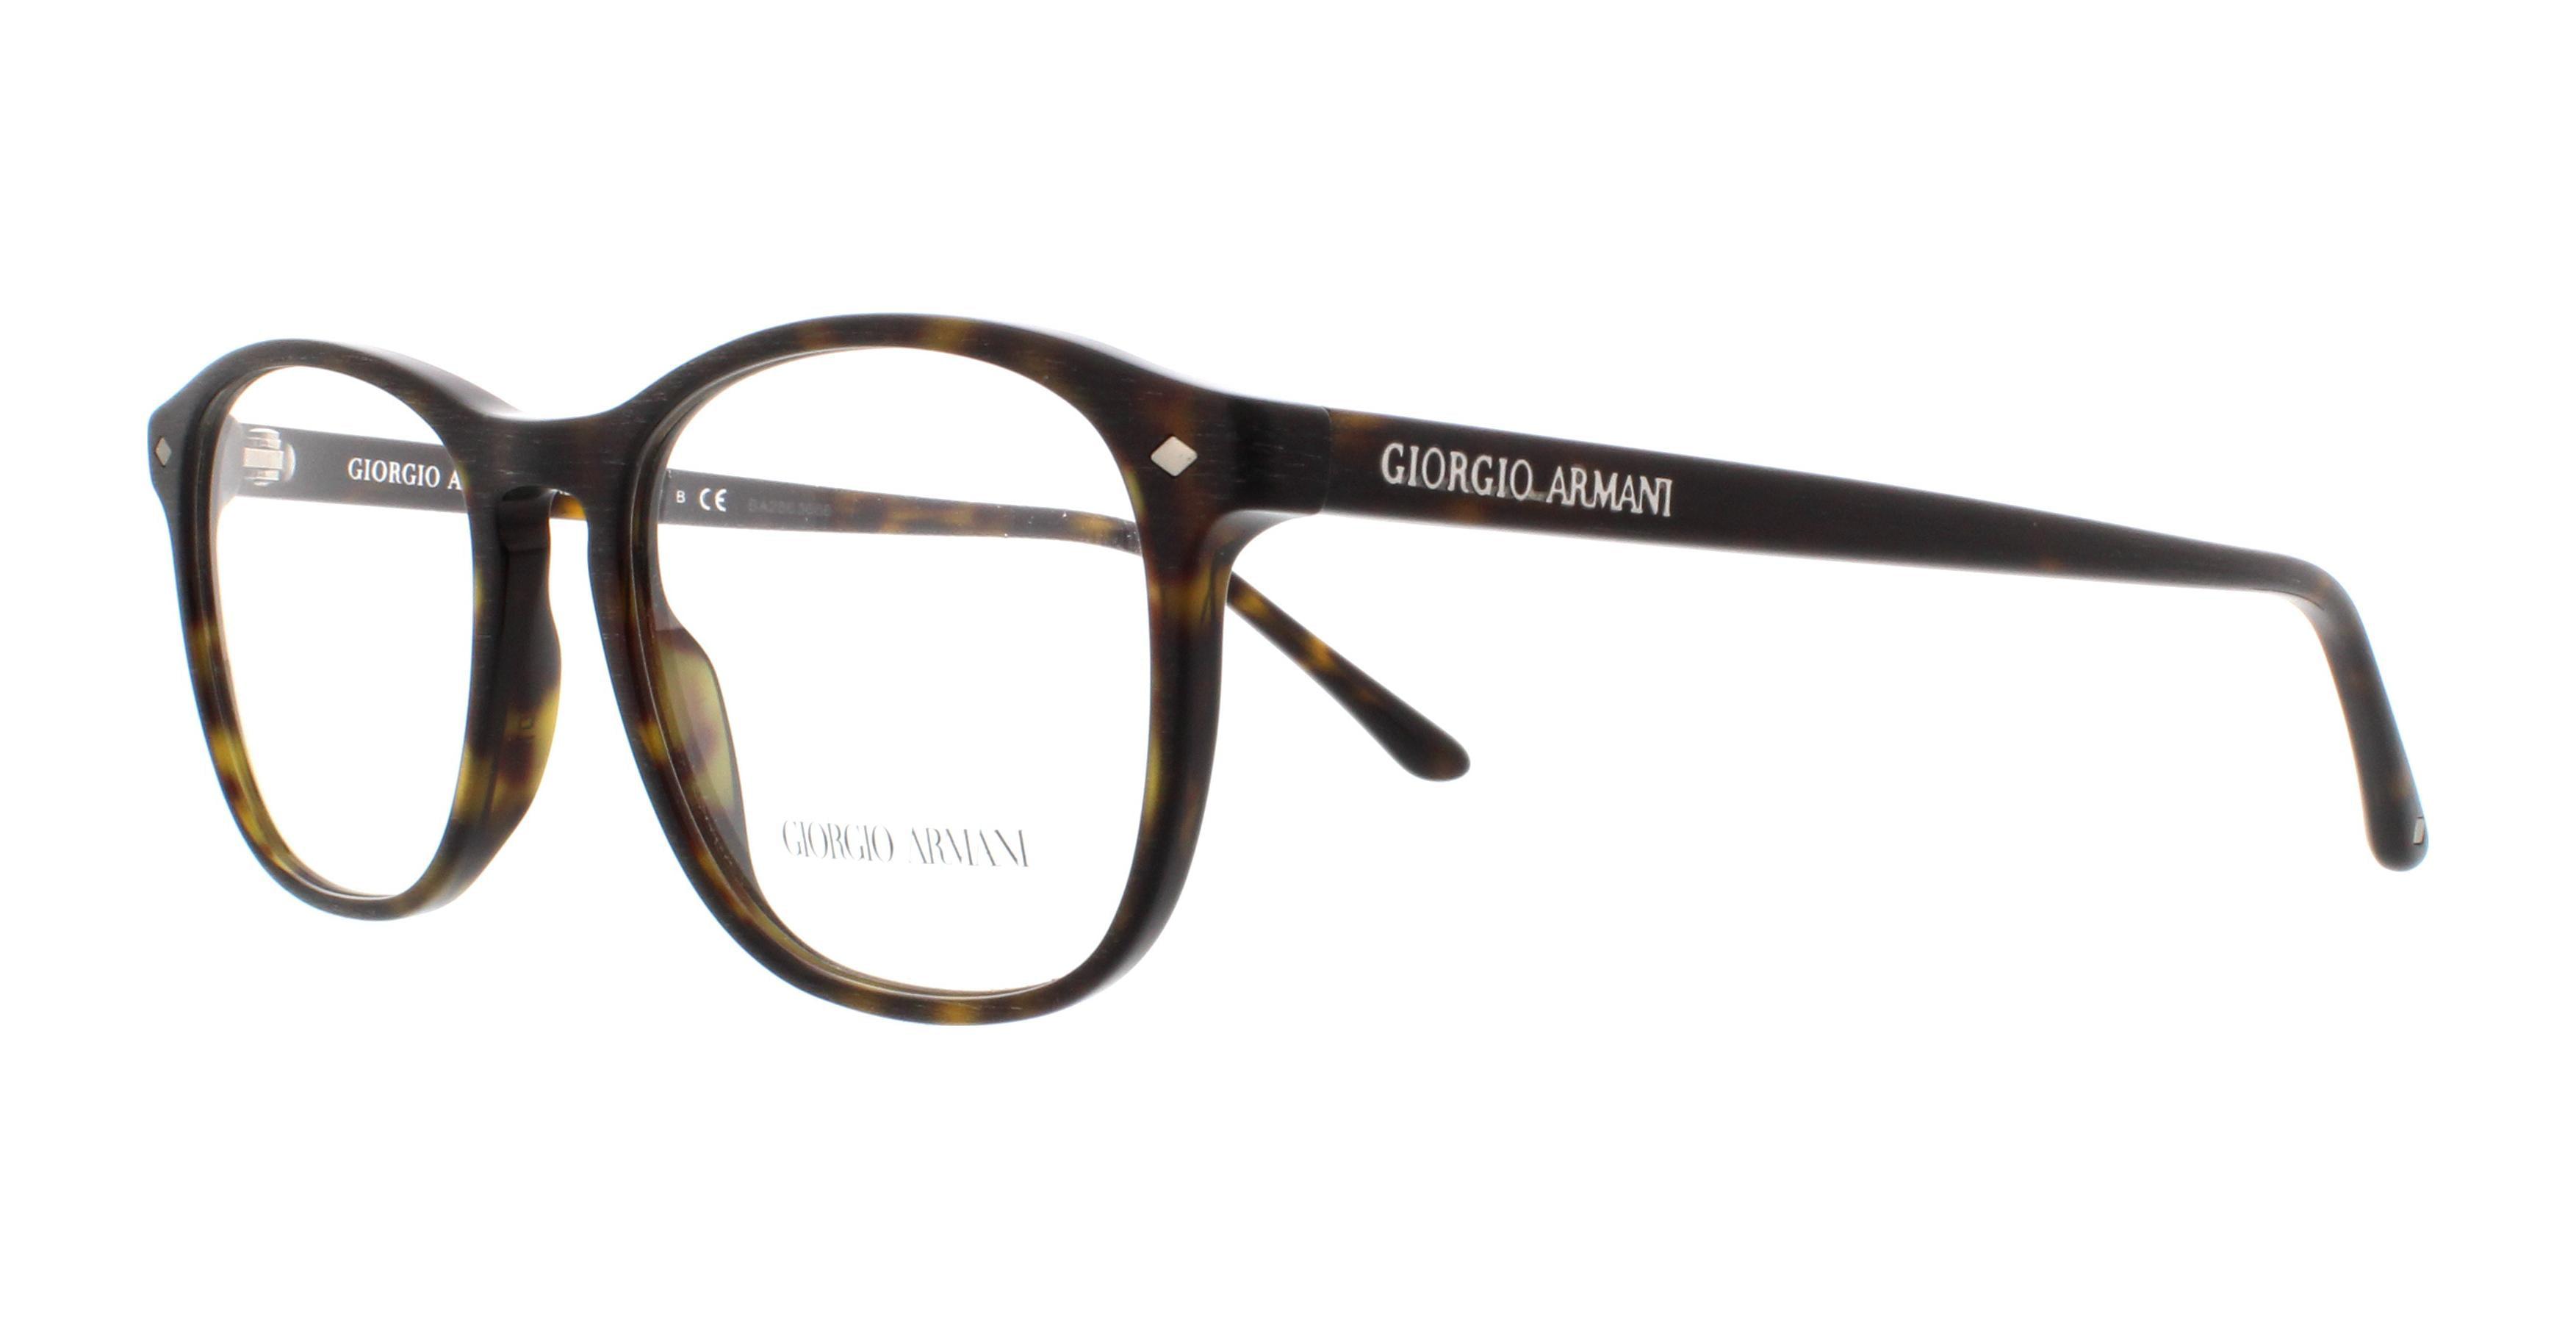 207c75d3e0 GIORGIO ARMANI Eyeglasses AR 7003 5002 Matte Havana 52MM